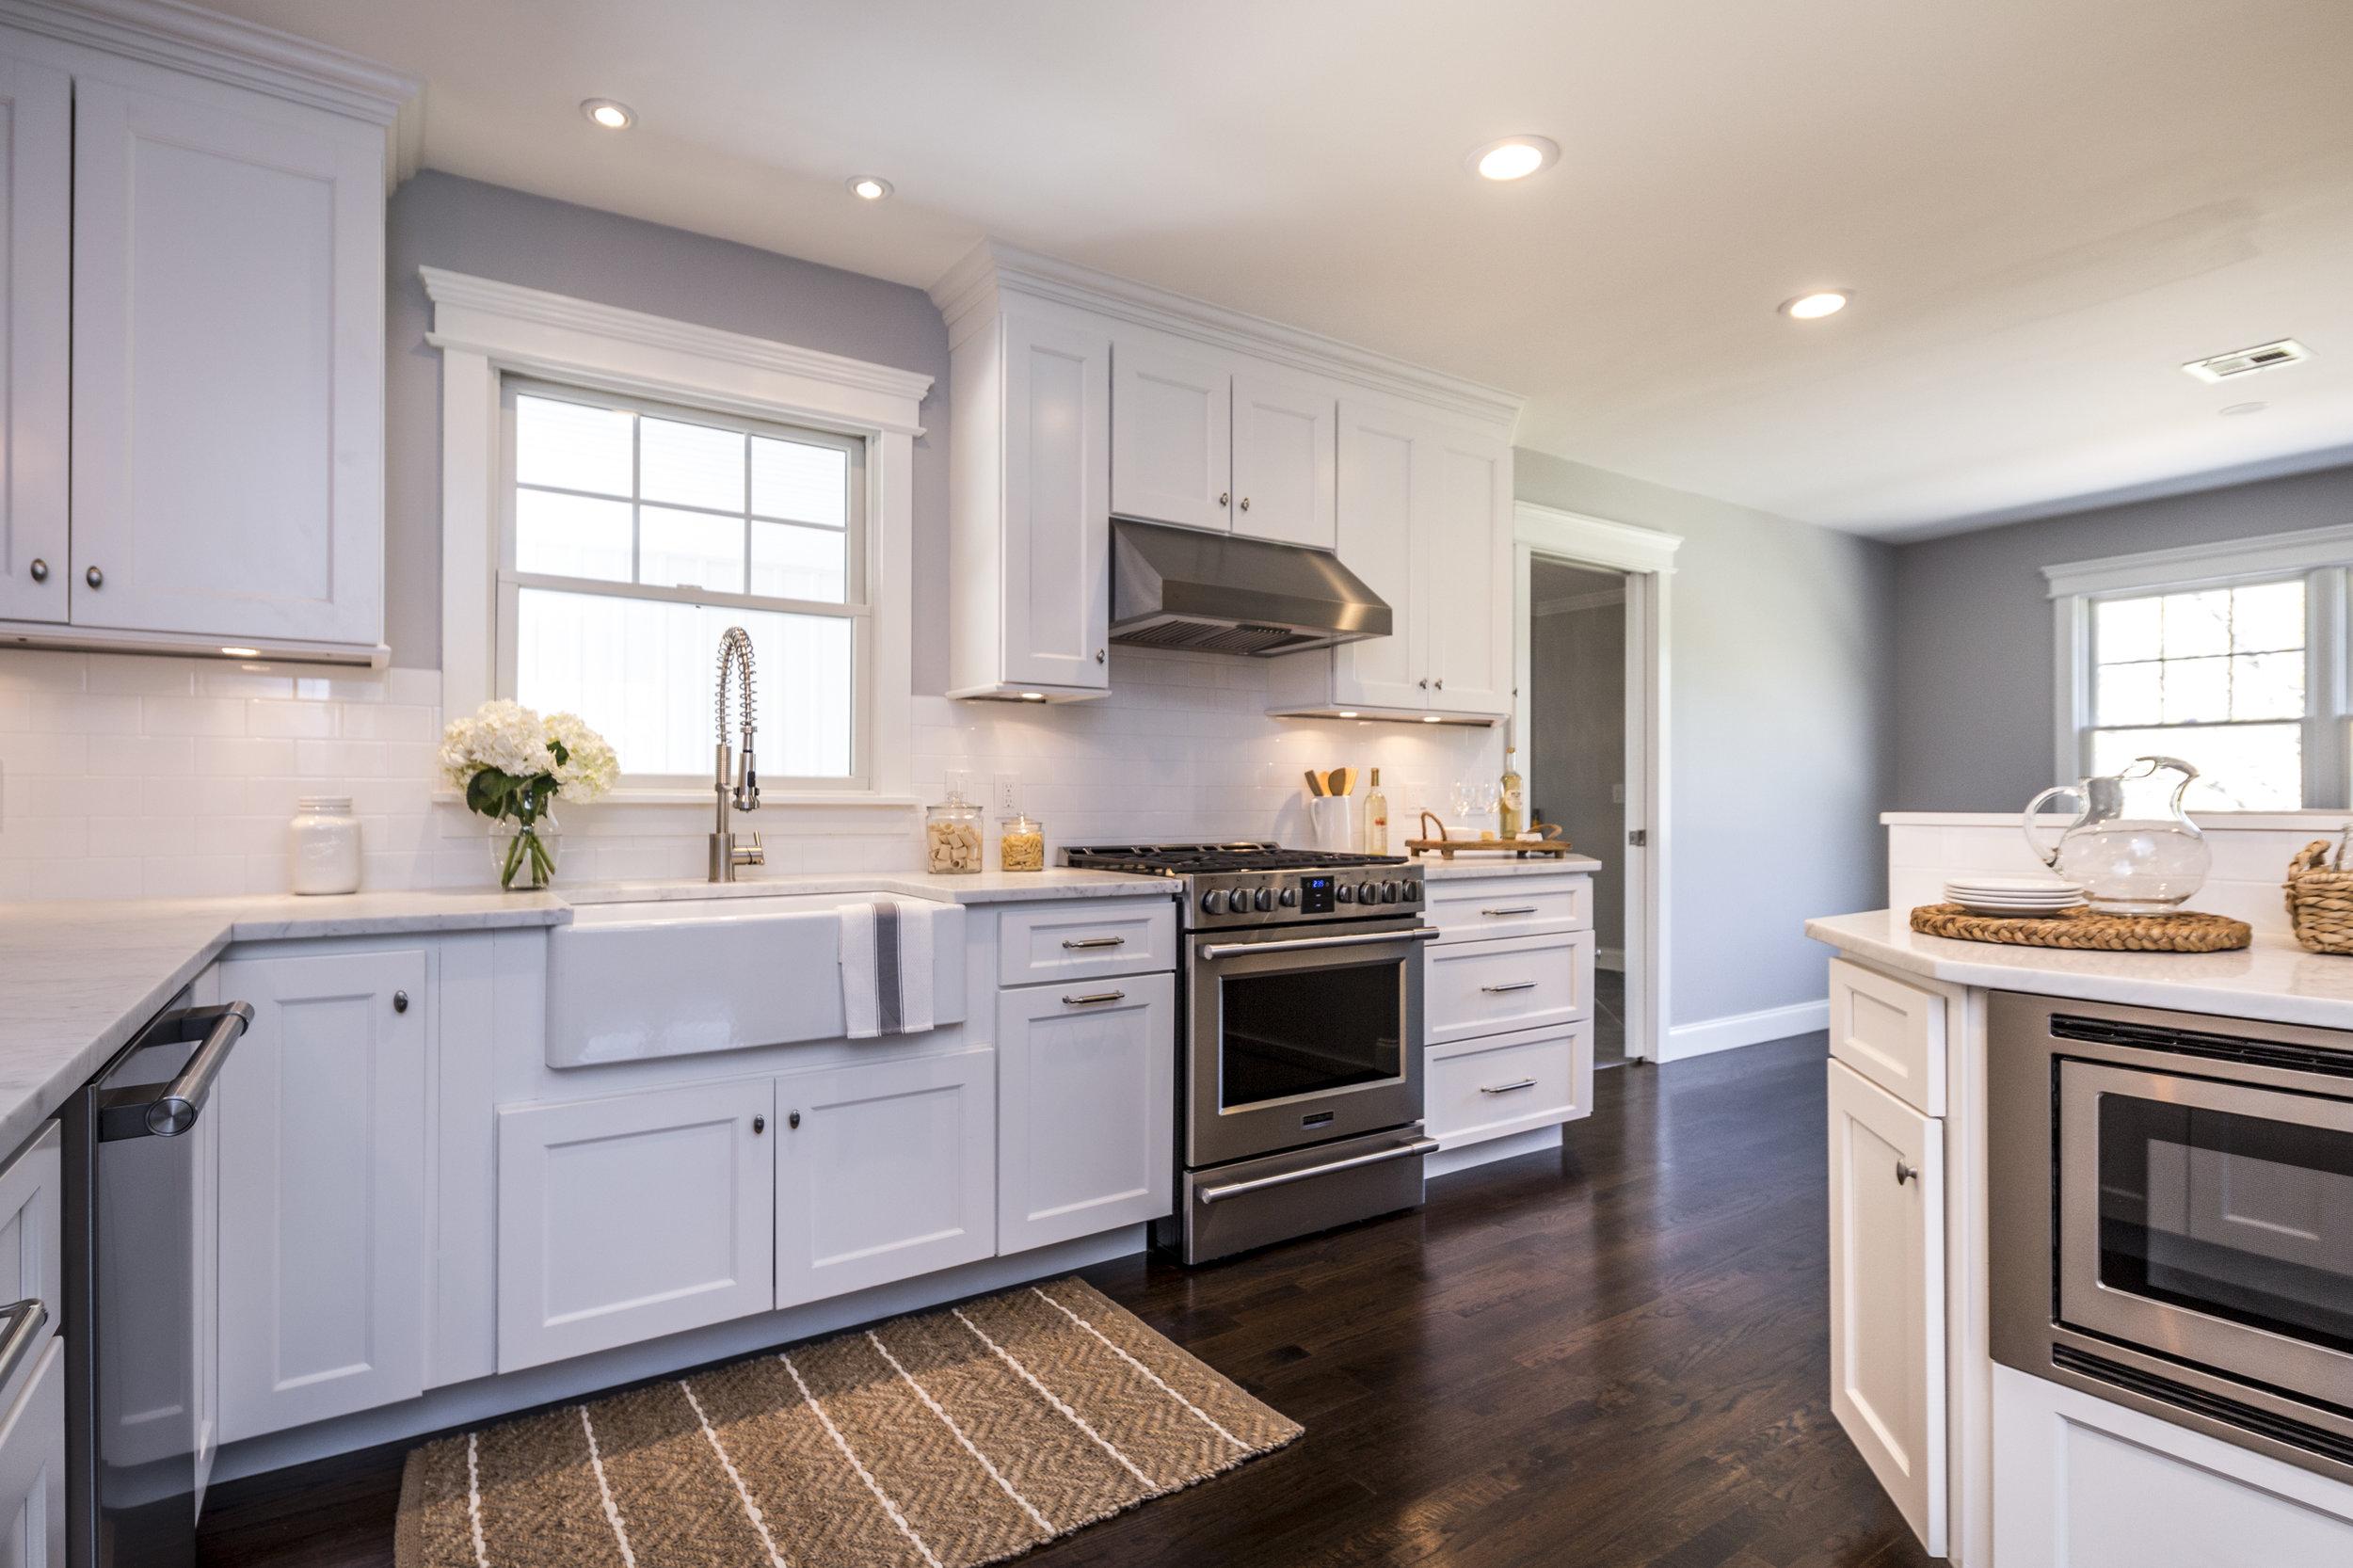 Renovation Jd Home Designs